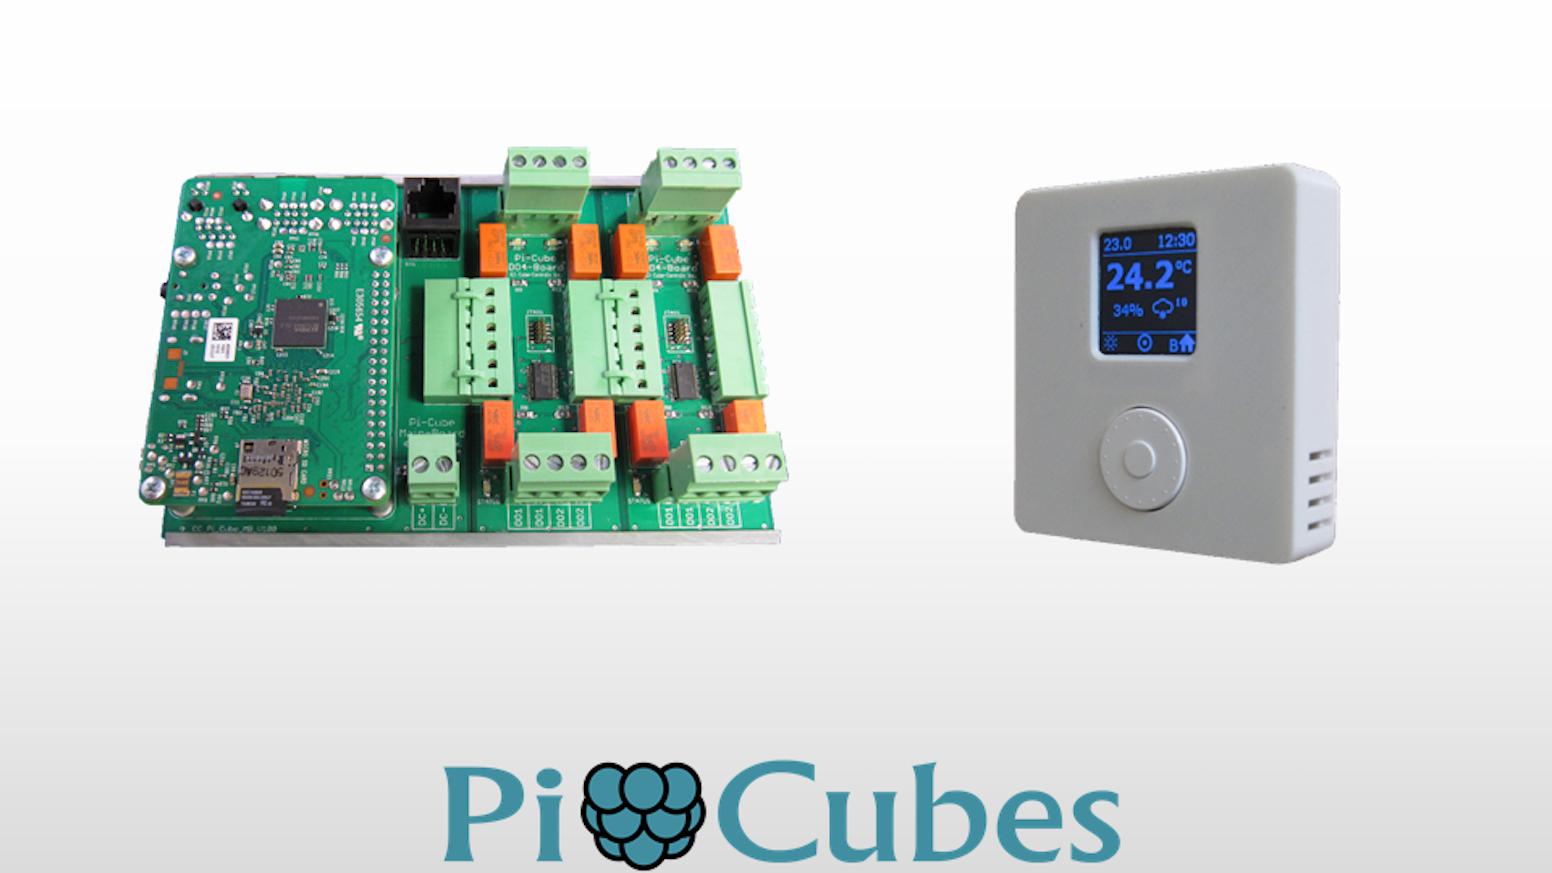 Pi Cubes - Raspberry Pi Based HVAC Automation System by Cube ...